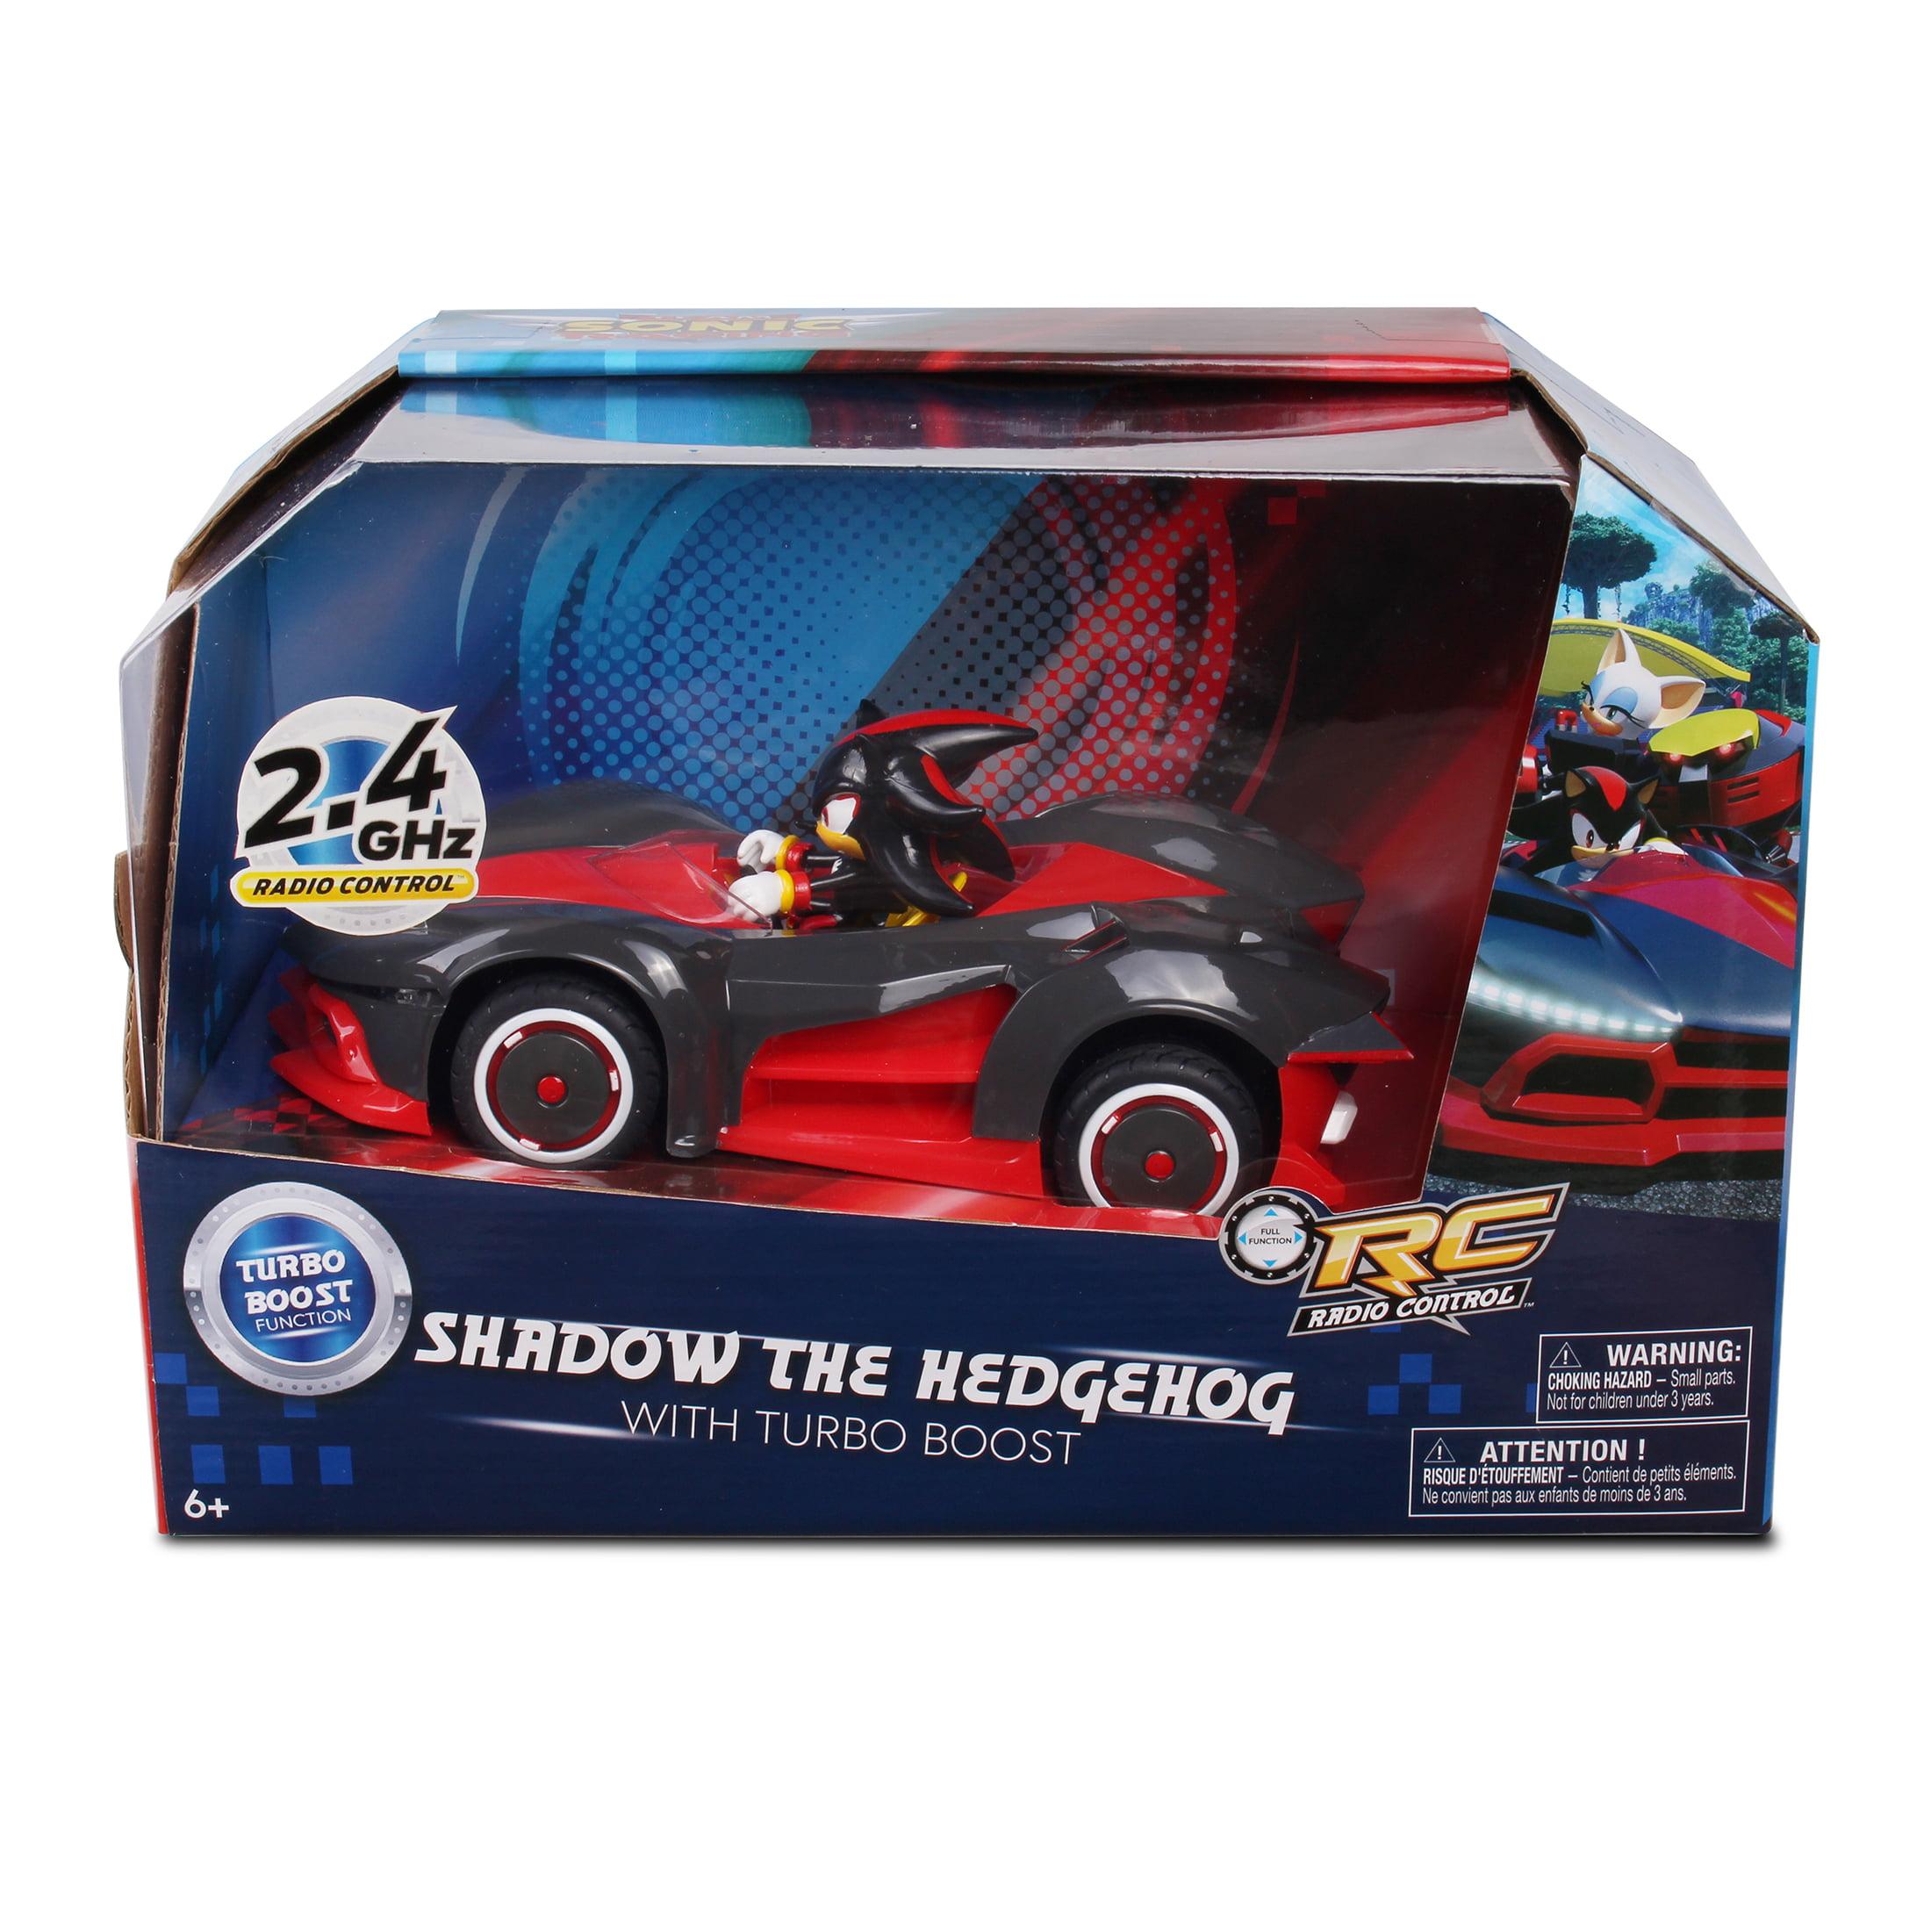 Nkok Sonic Team Racing Radio Controlled Shadow The Hedgehog W Turbo Boost Walmart Com Walmart Com